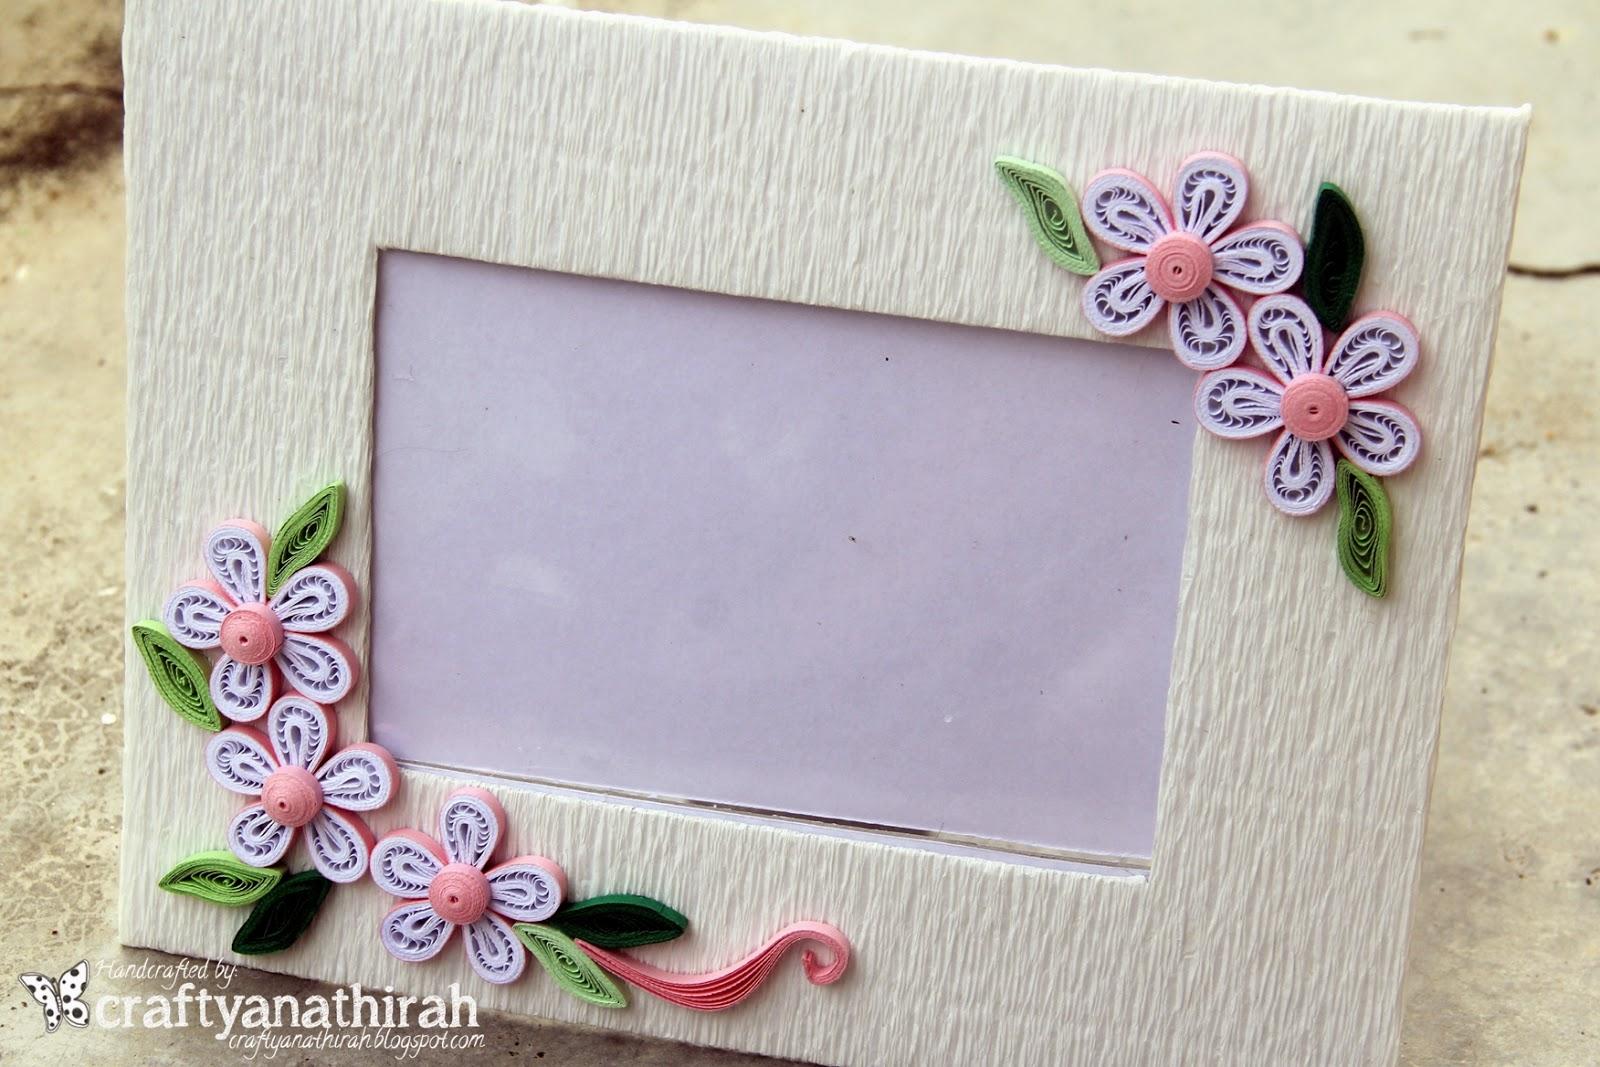 Unique Frame Handmade Crest - Picture Frame Ideas - stillhouseplants ...